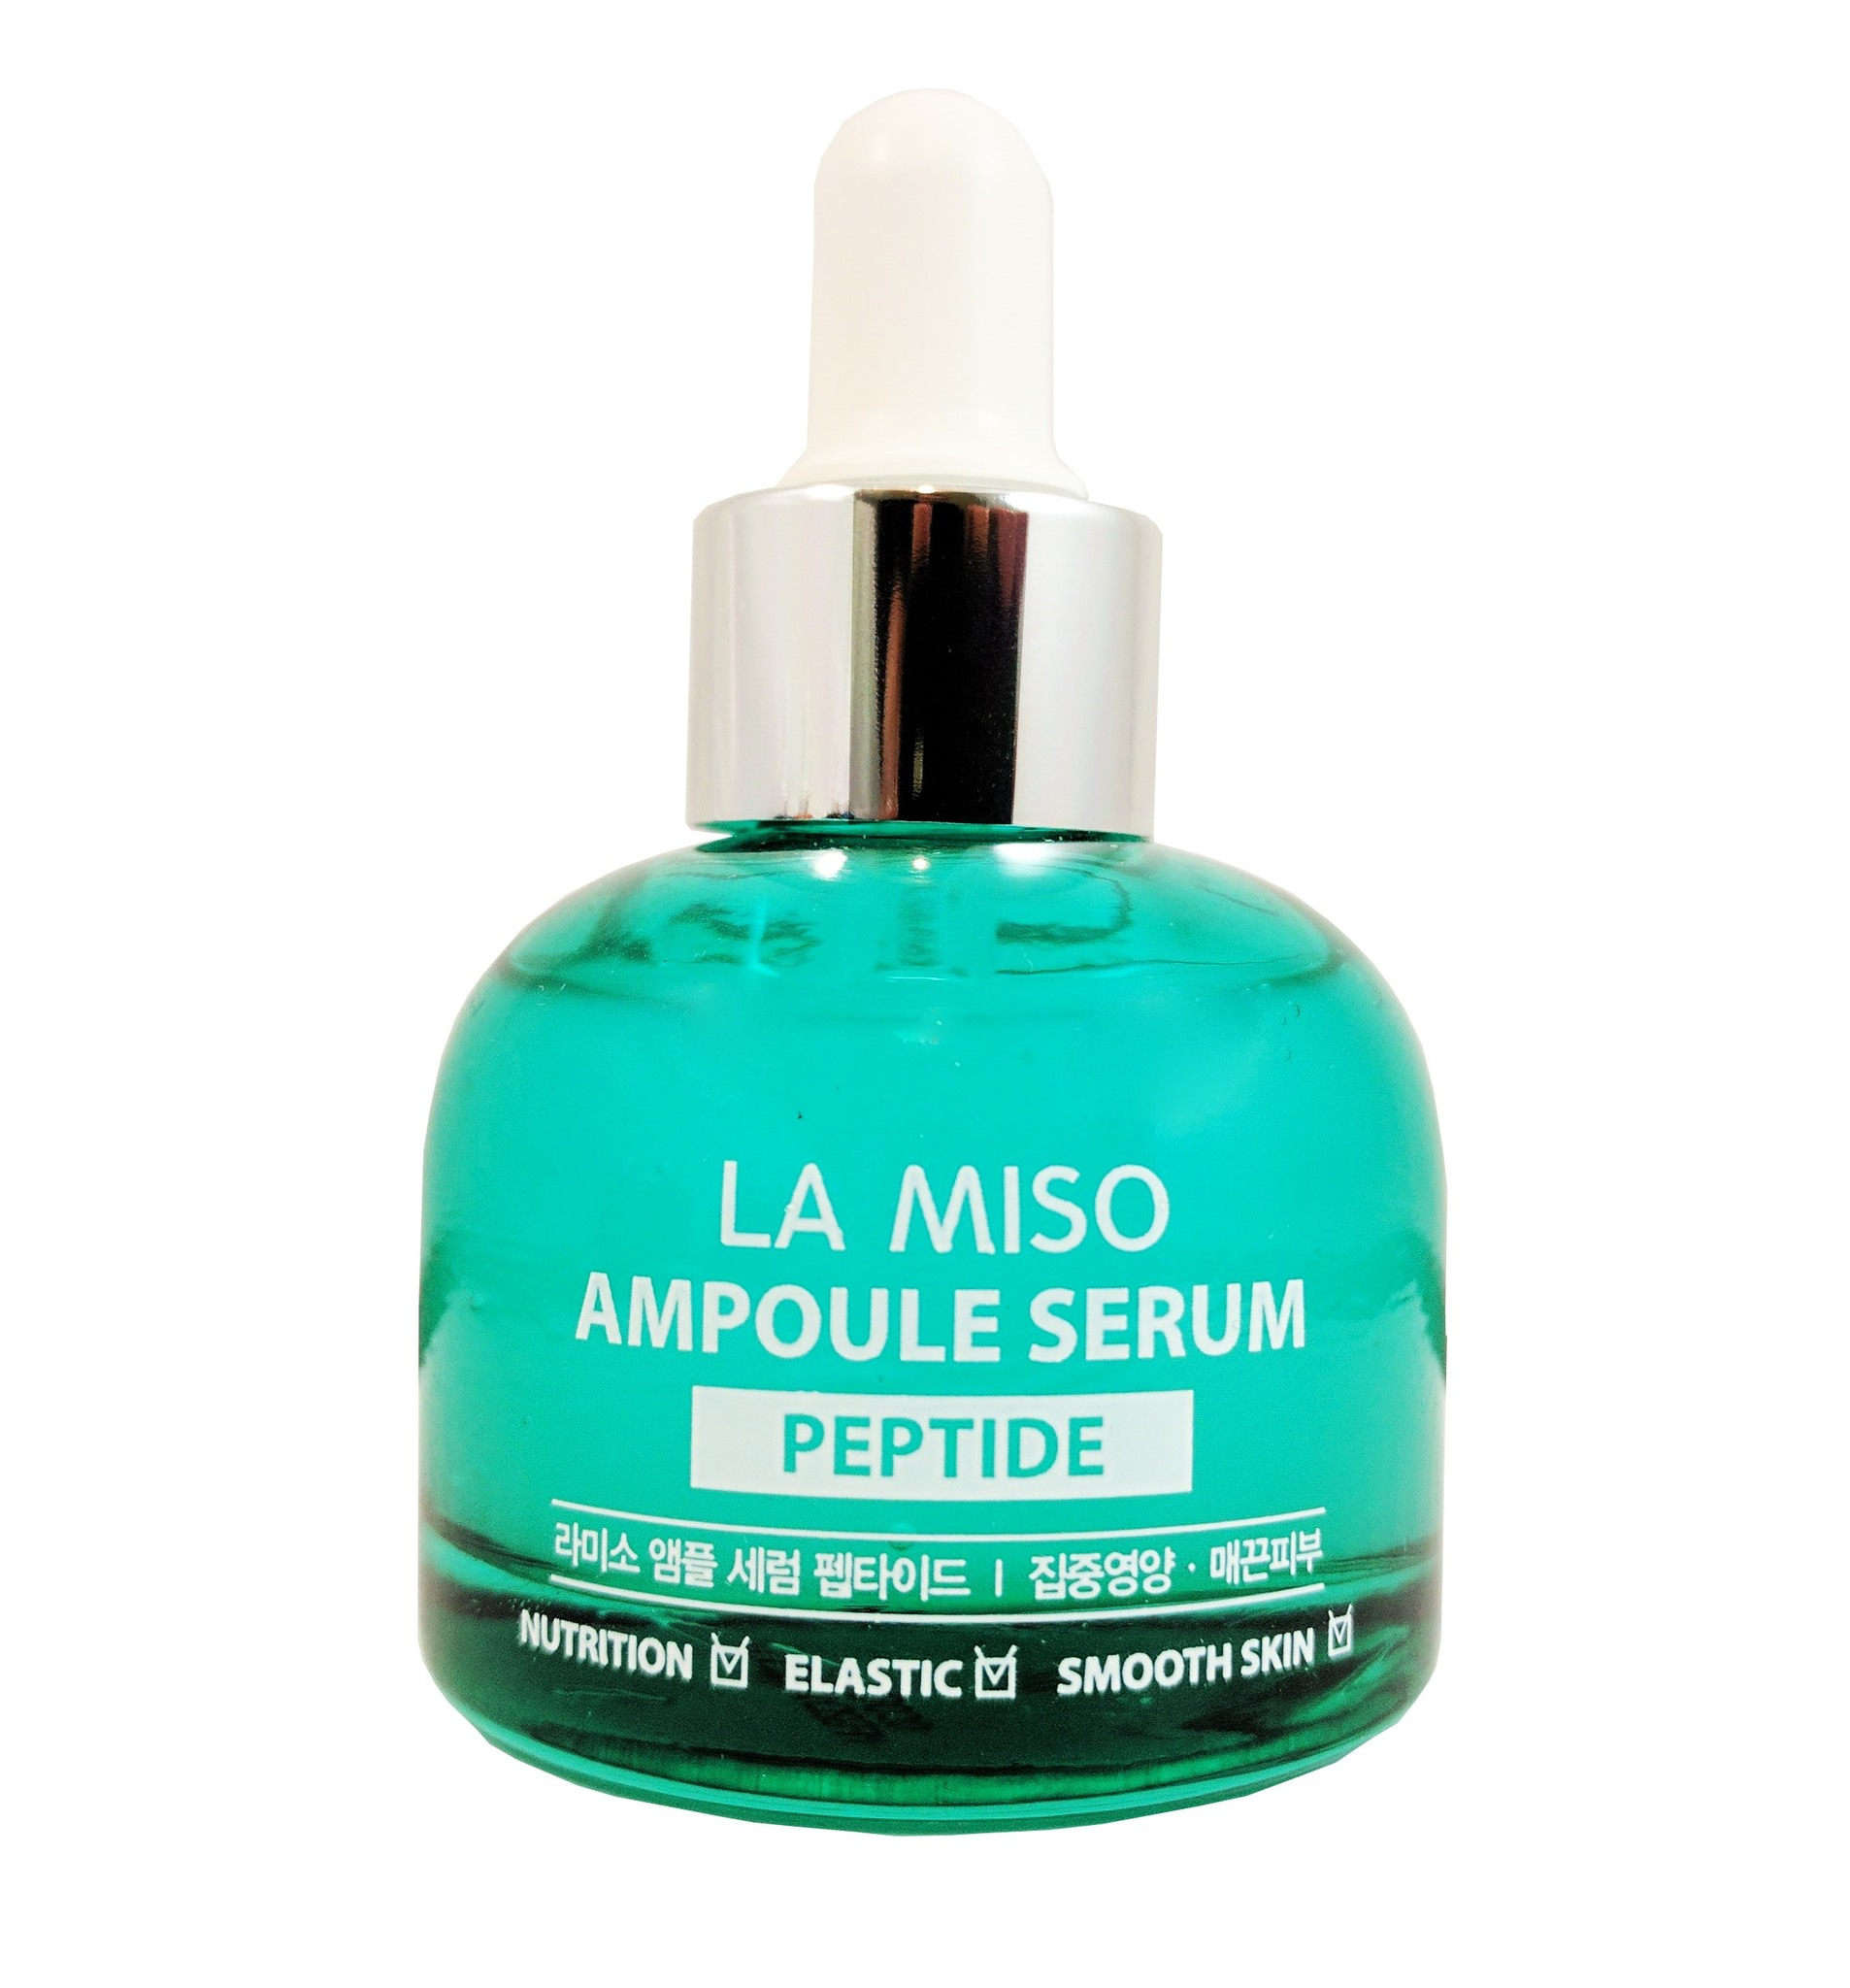 Восстанавливающая сыворотка с пептидами La Miso Ampoule Serum Peptide Корея